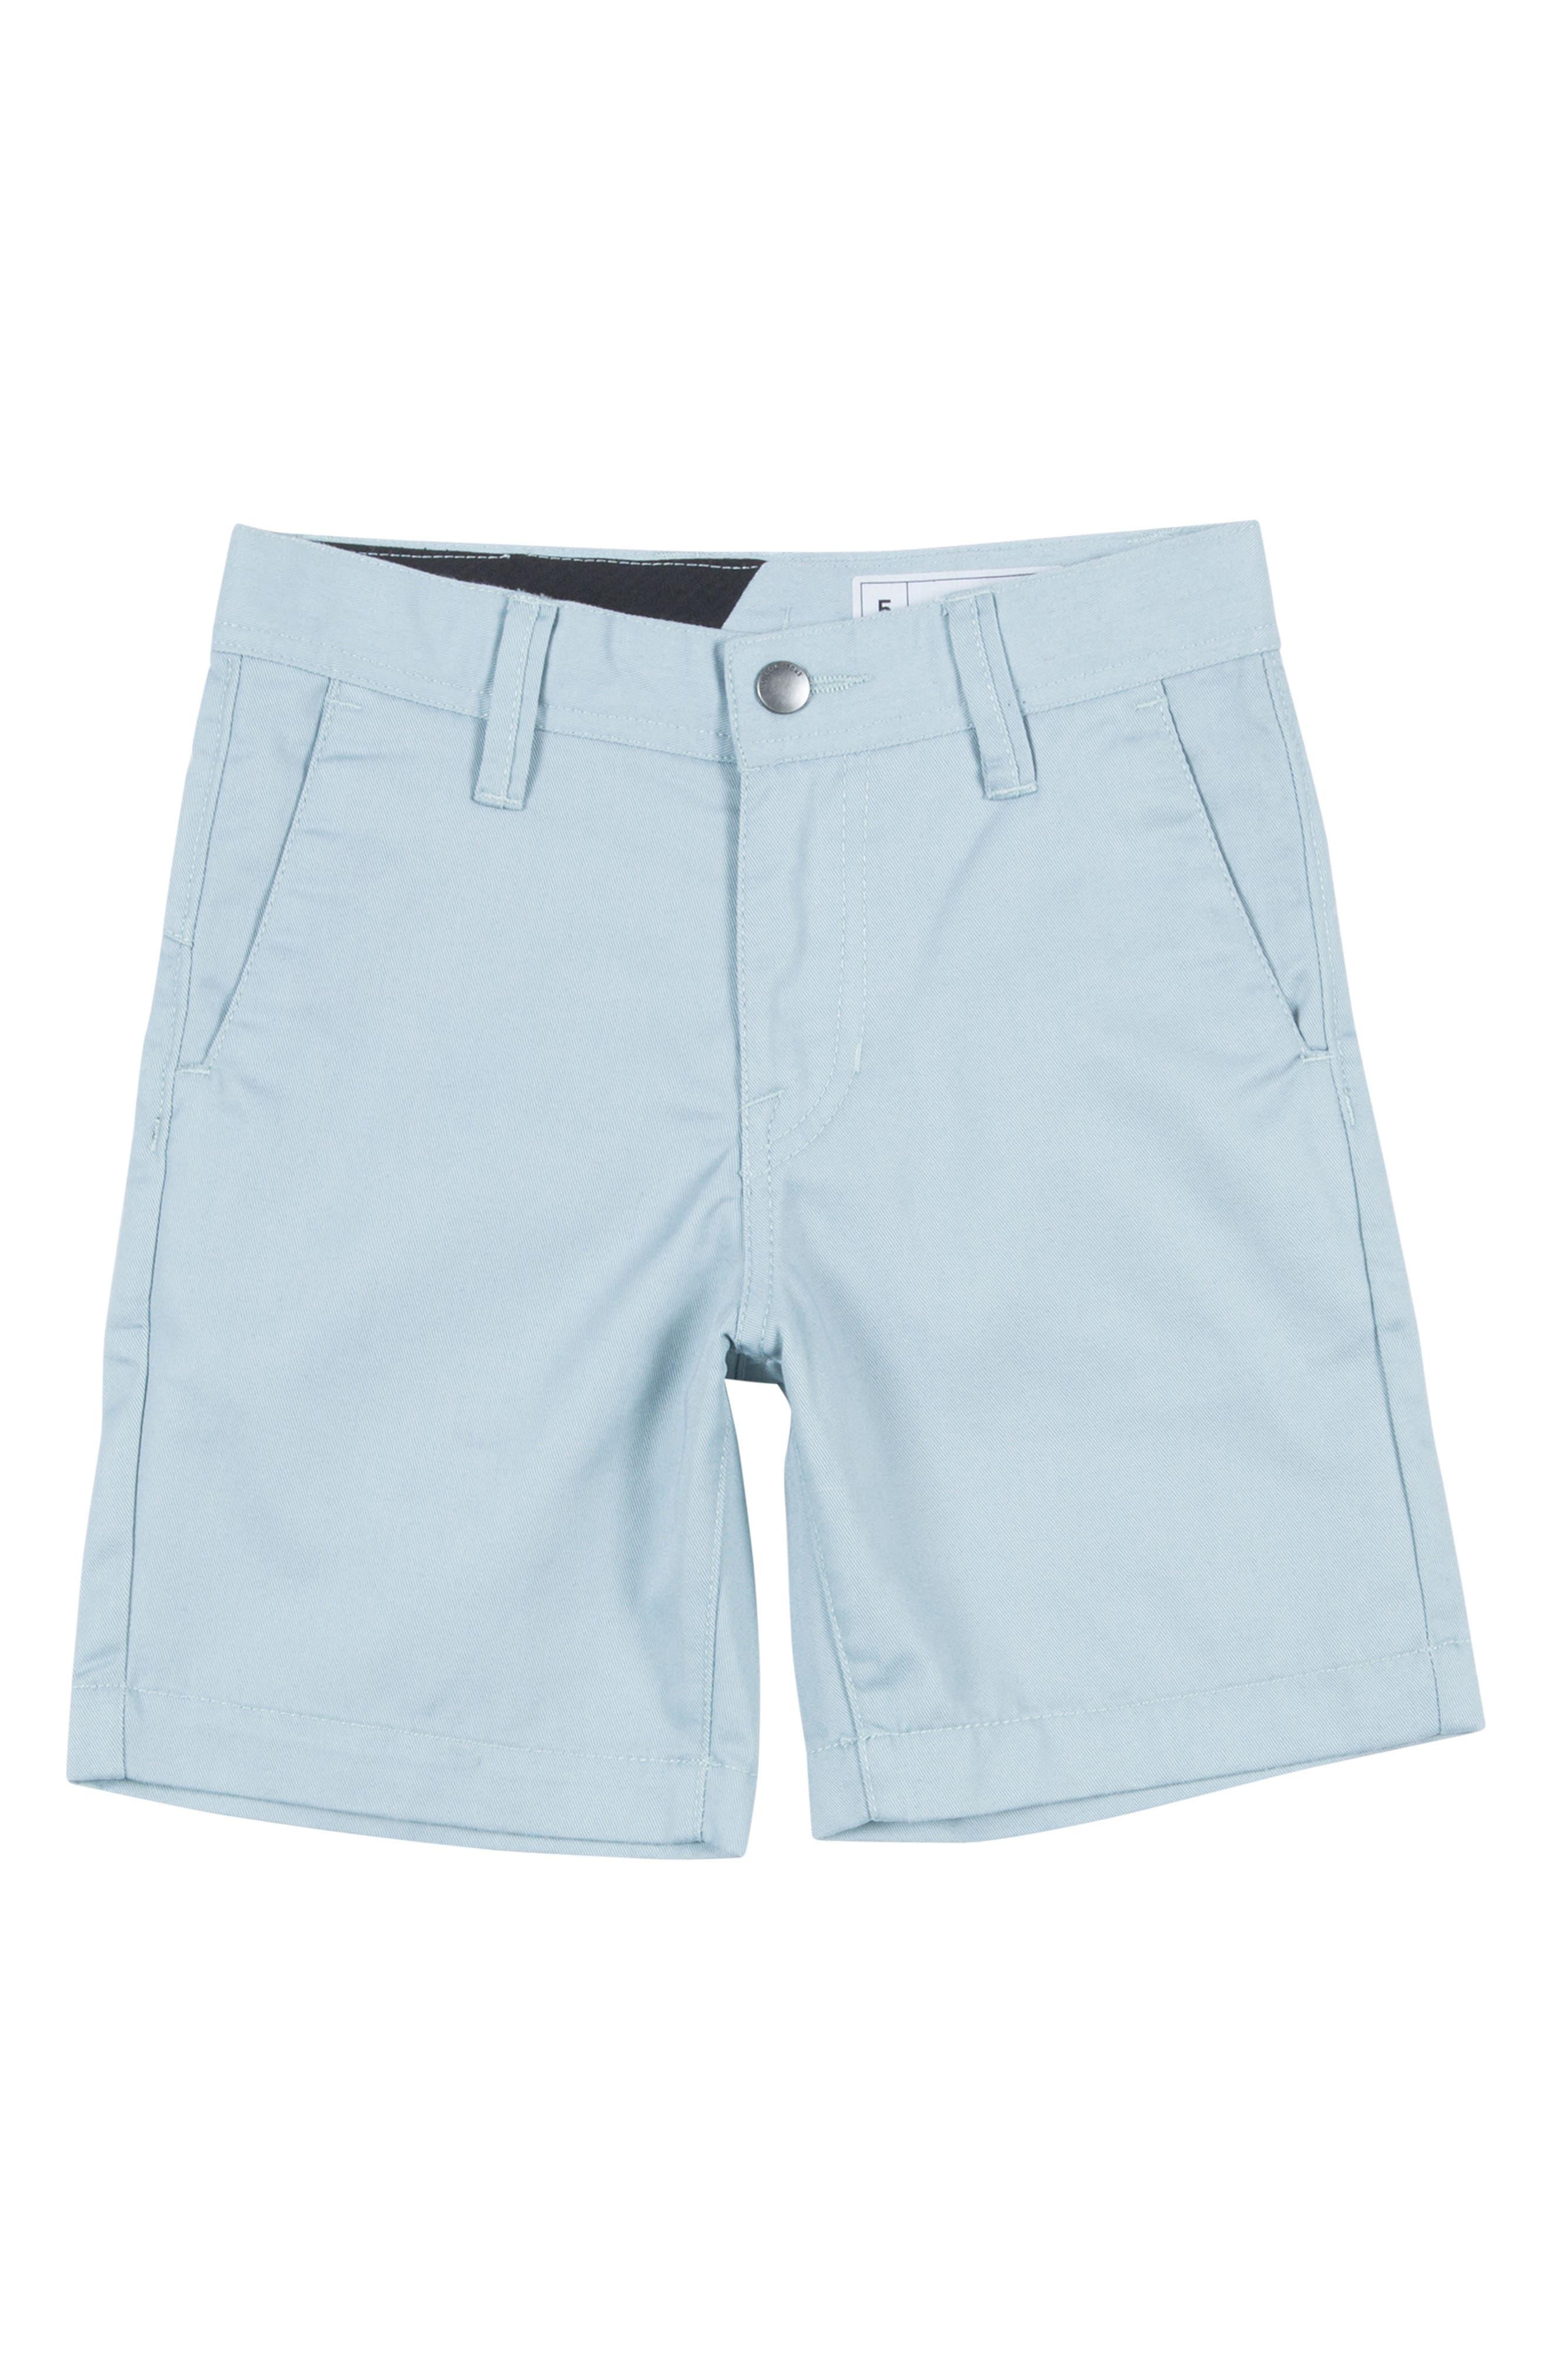 Main Image - Volcom 'Modern' Chino Shorts (Toddler Boys & Little Boys)